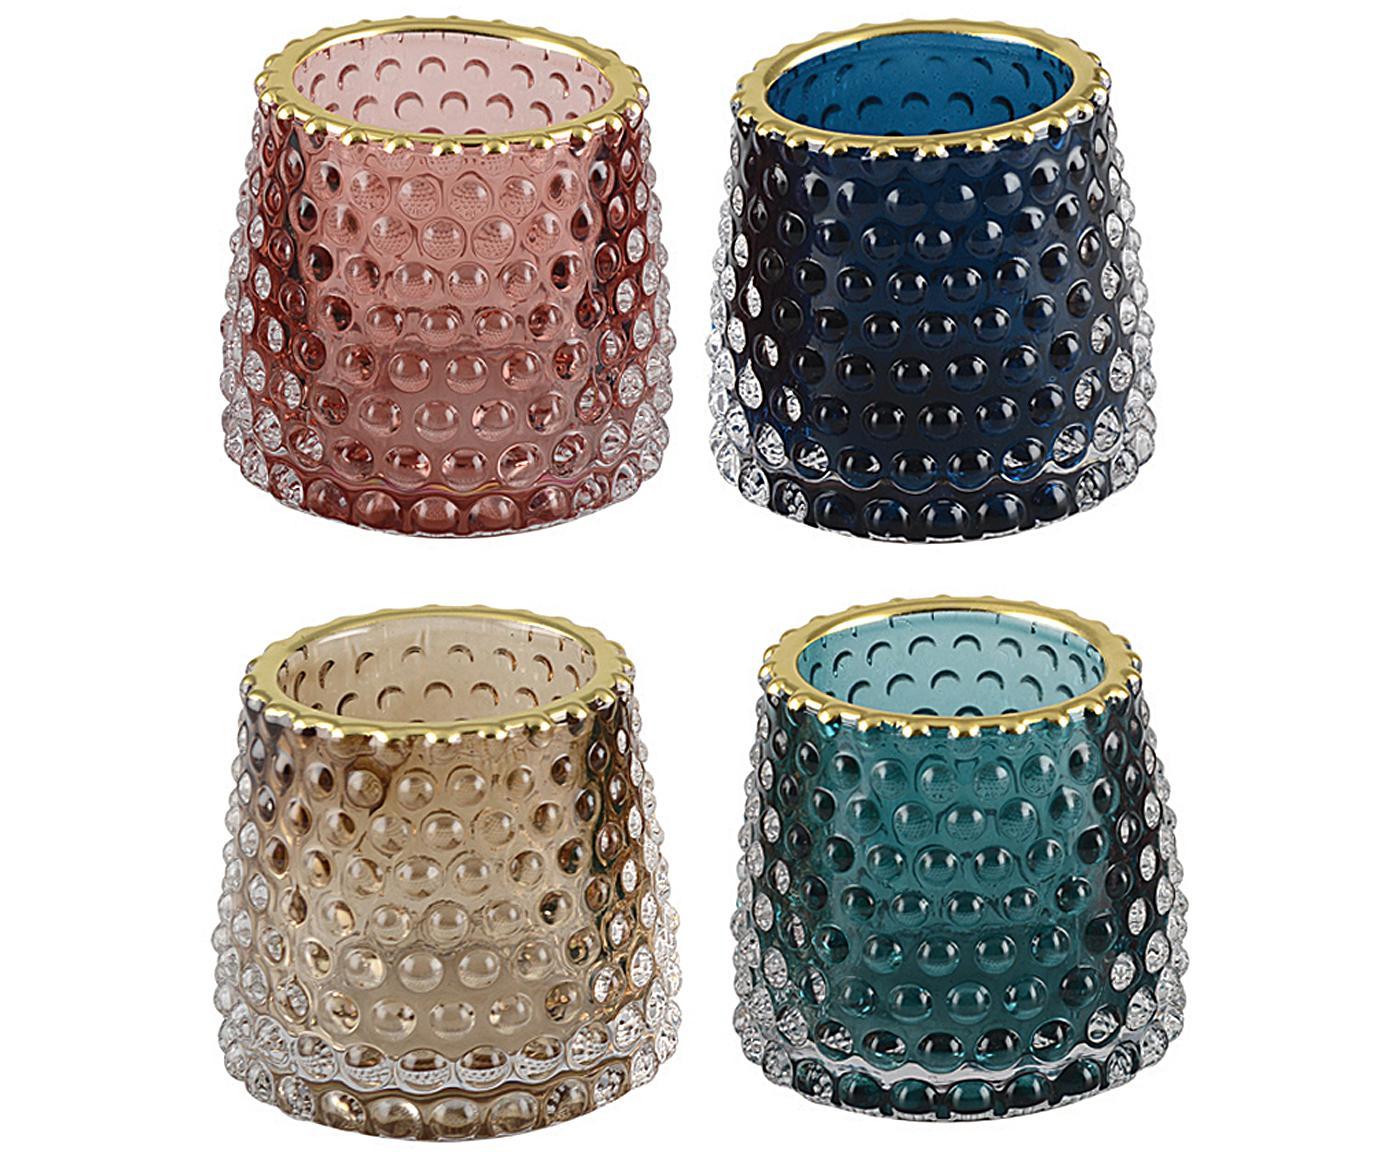 Set 4 portacandele Rimmon, Vetro, Multicolore, dorato, Ø 8 x Alt. 7 cm